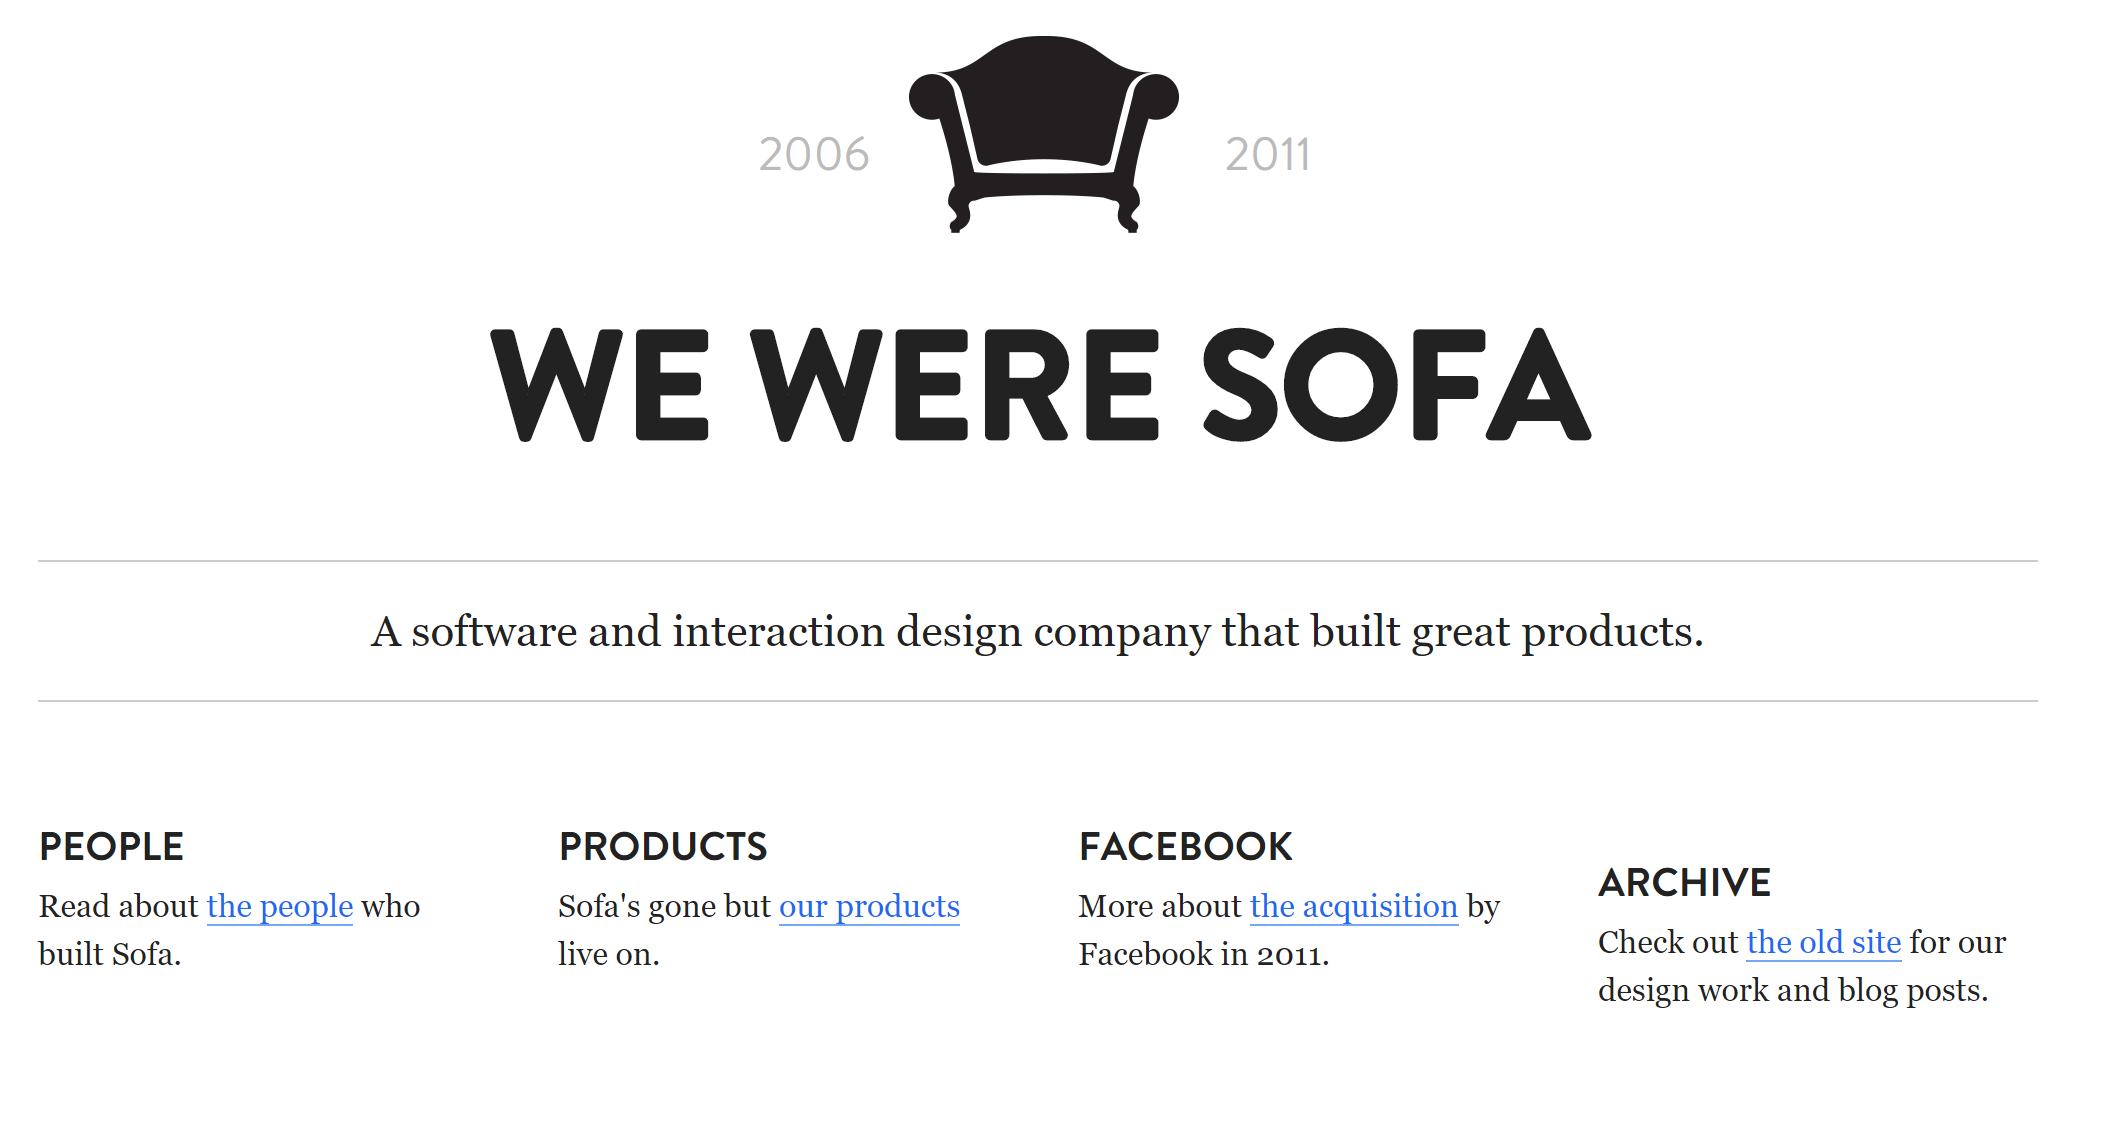 We were sofa - ホワイトスペースとは?デザインの重要性や効果的な使い方まとめ